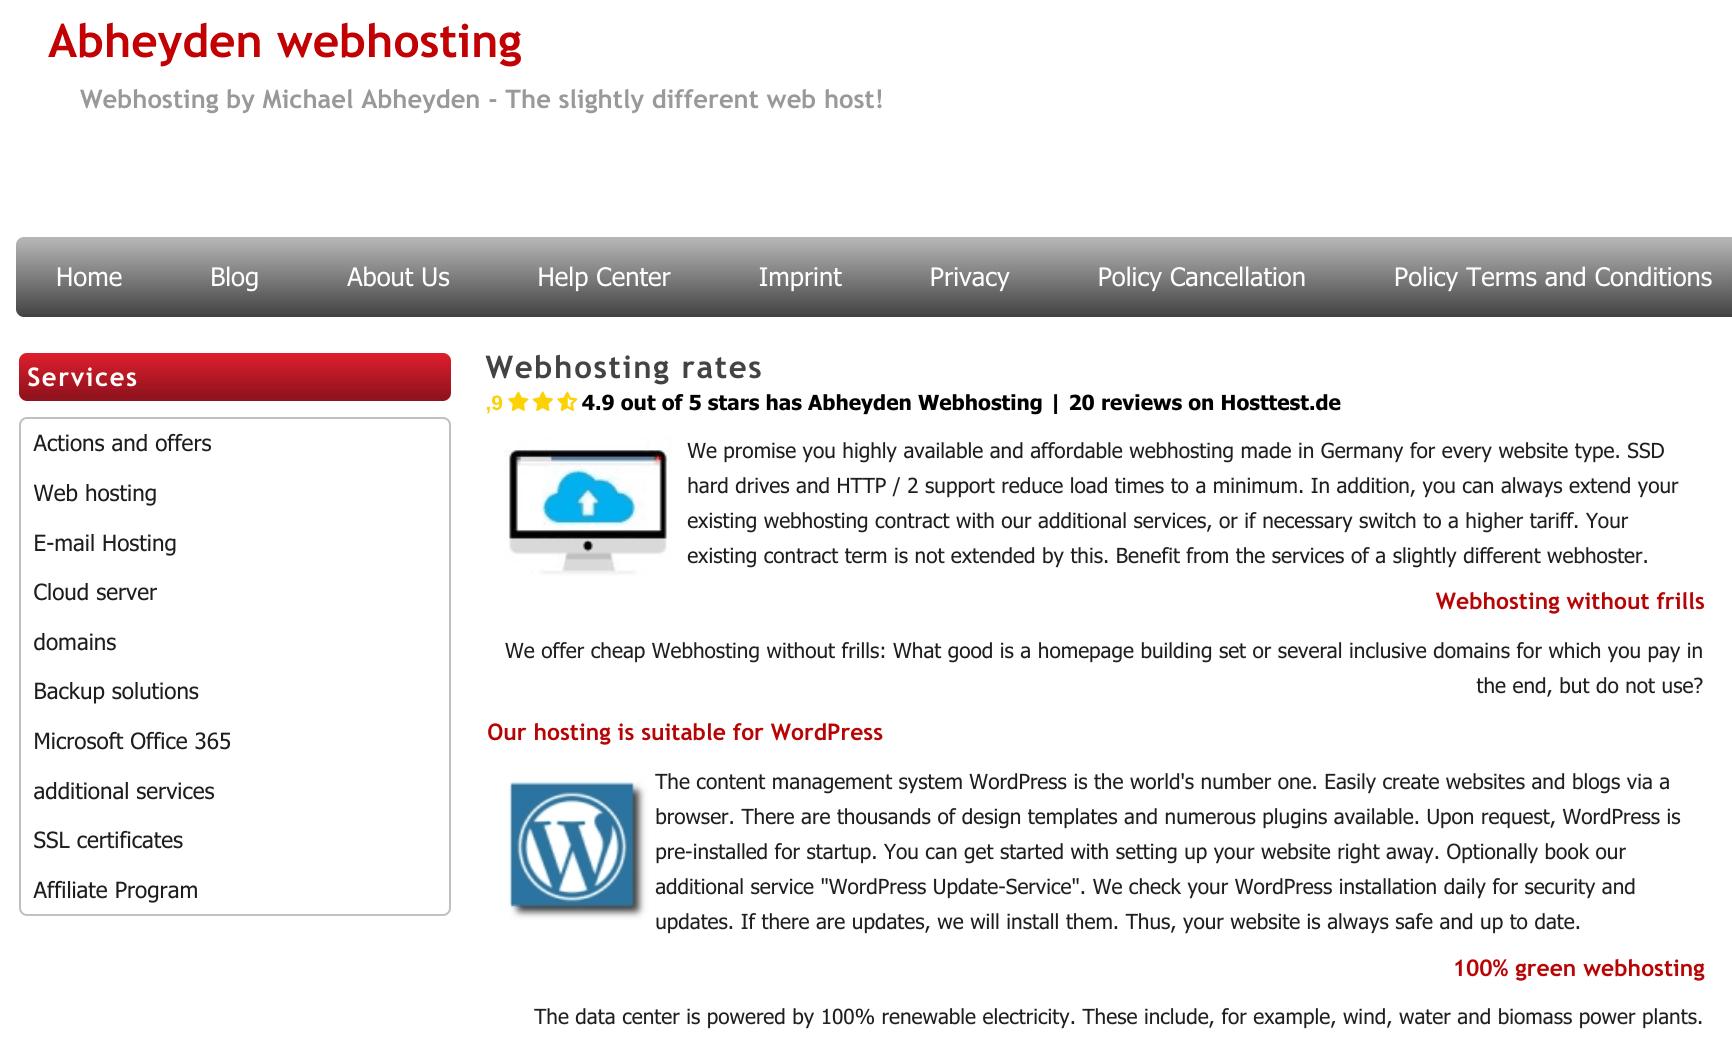 Abheyden Webhosting